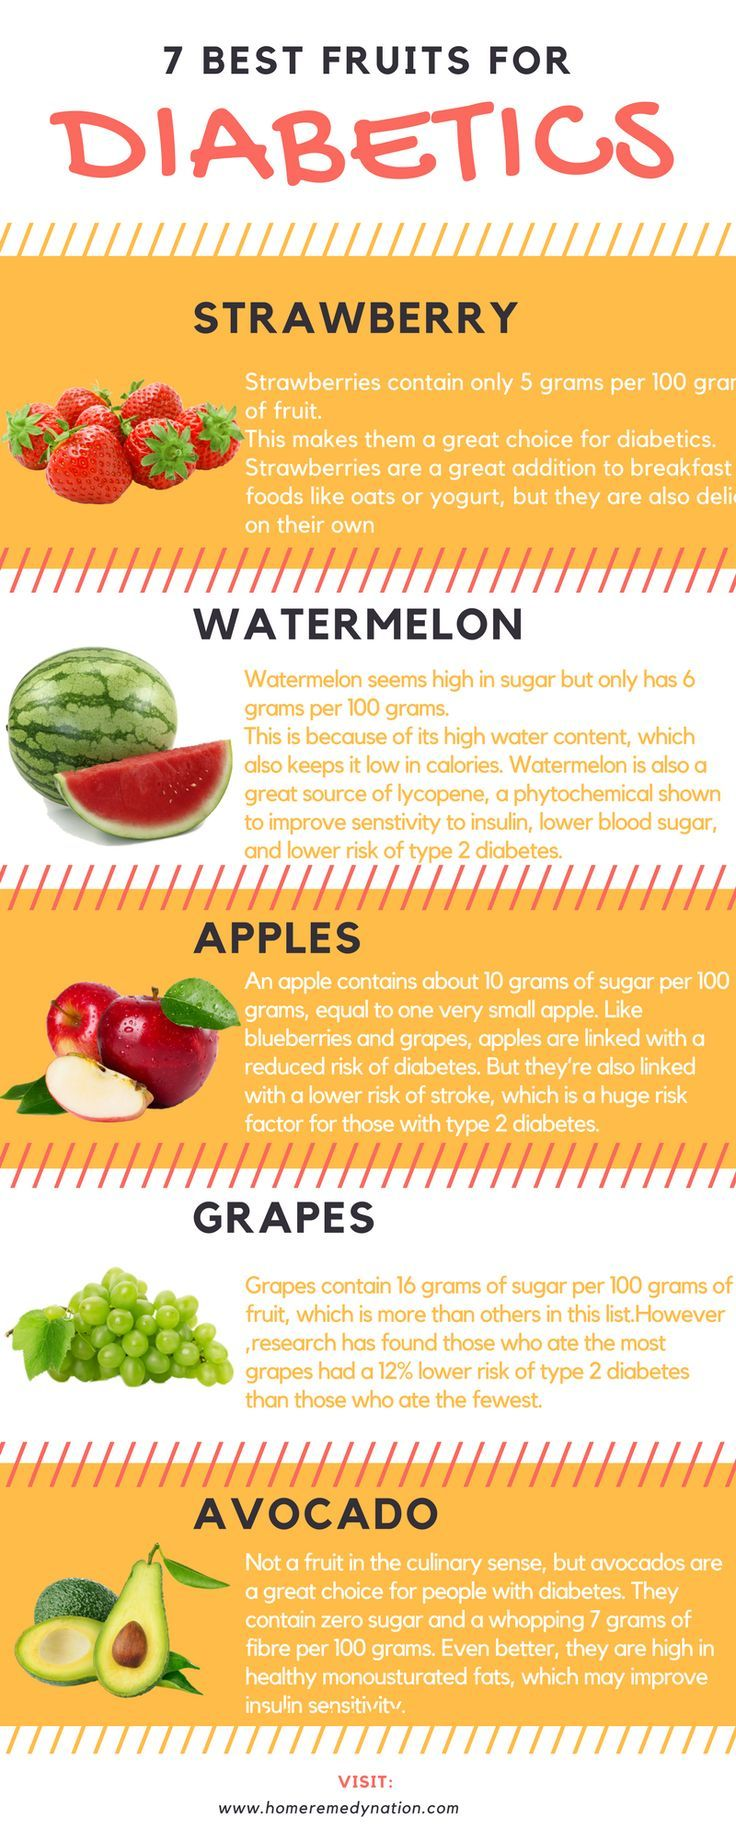 Diabetes A (With images) Best fruits for diabetics